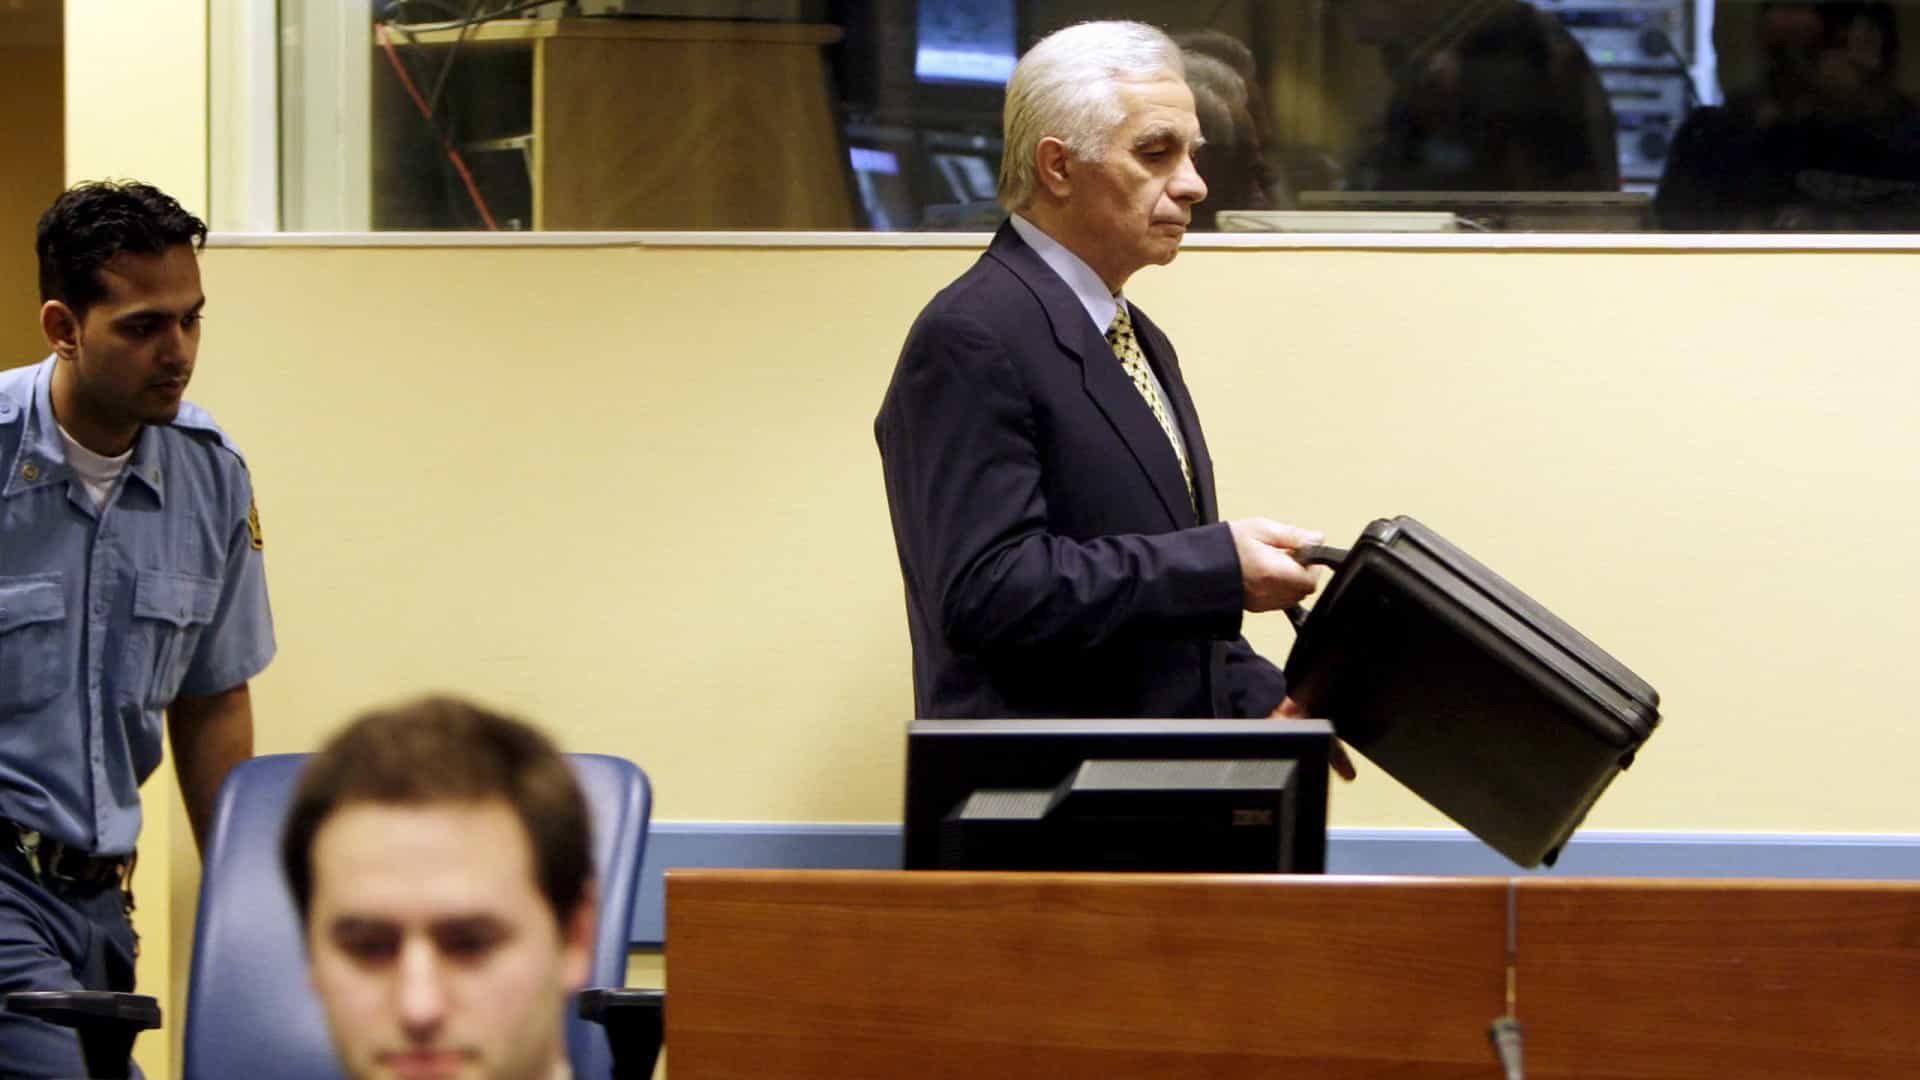 Bósnia: ex-líder condenado por crimes de guerra morre de Covid